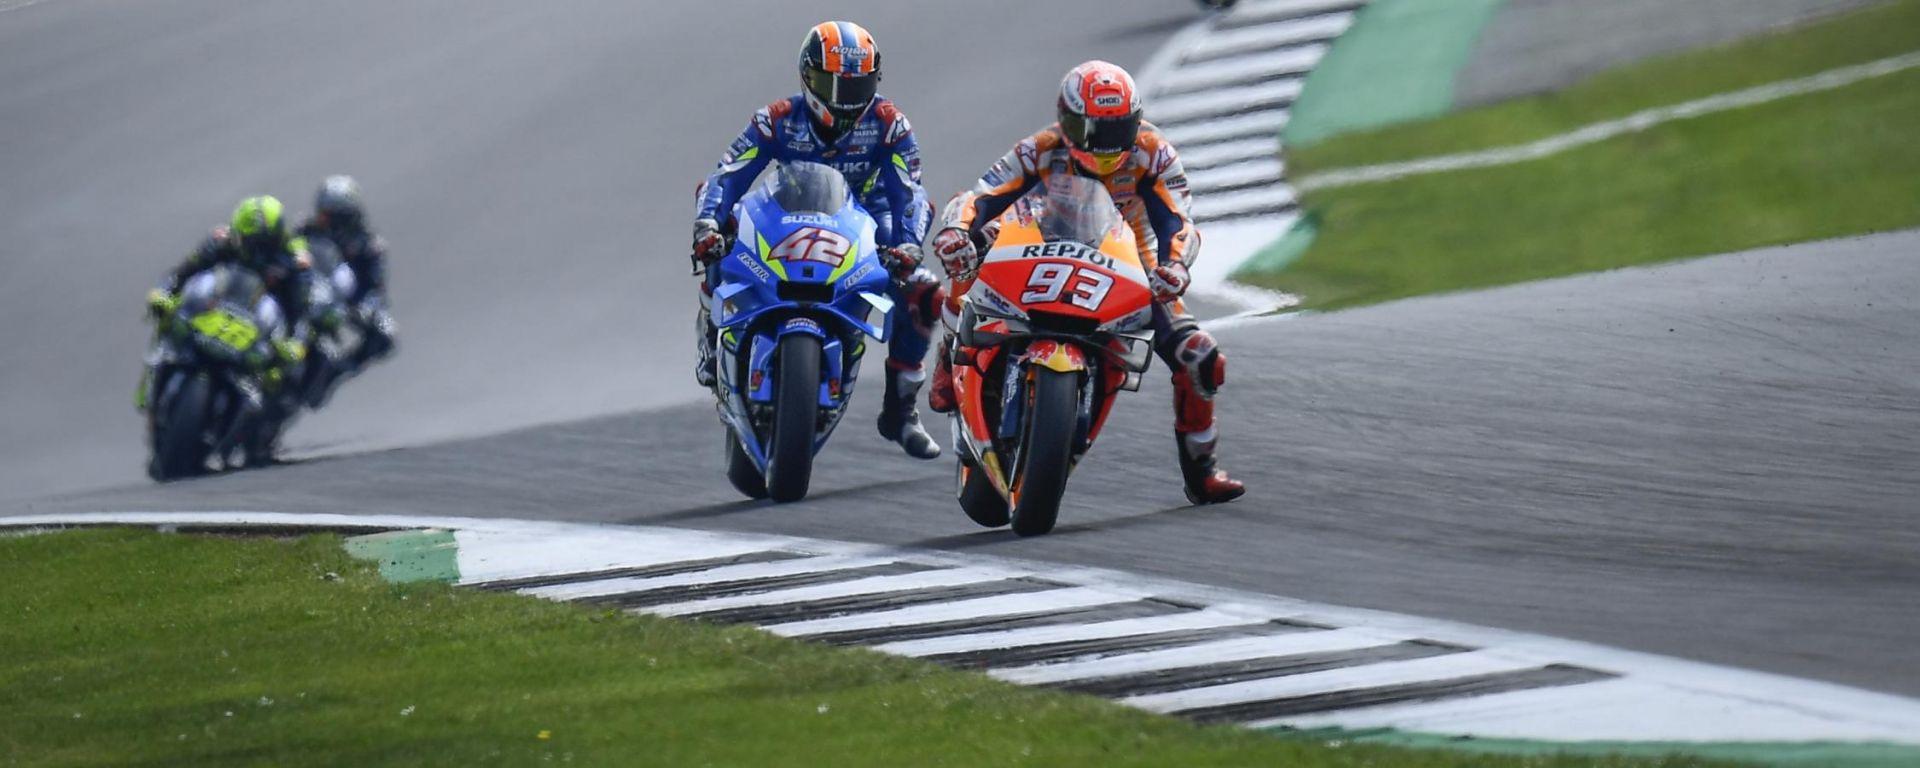 MotoGP Gran Bretagna 2019, Alex Rins (Suzuki) e Marc Marquez (Honda) vanno in fuga